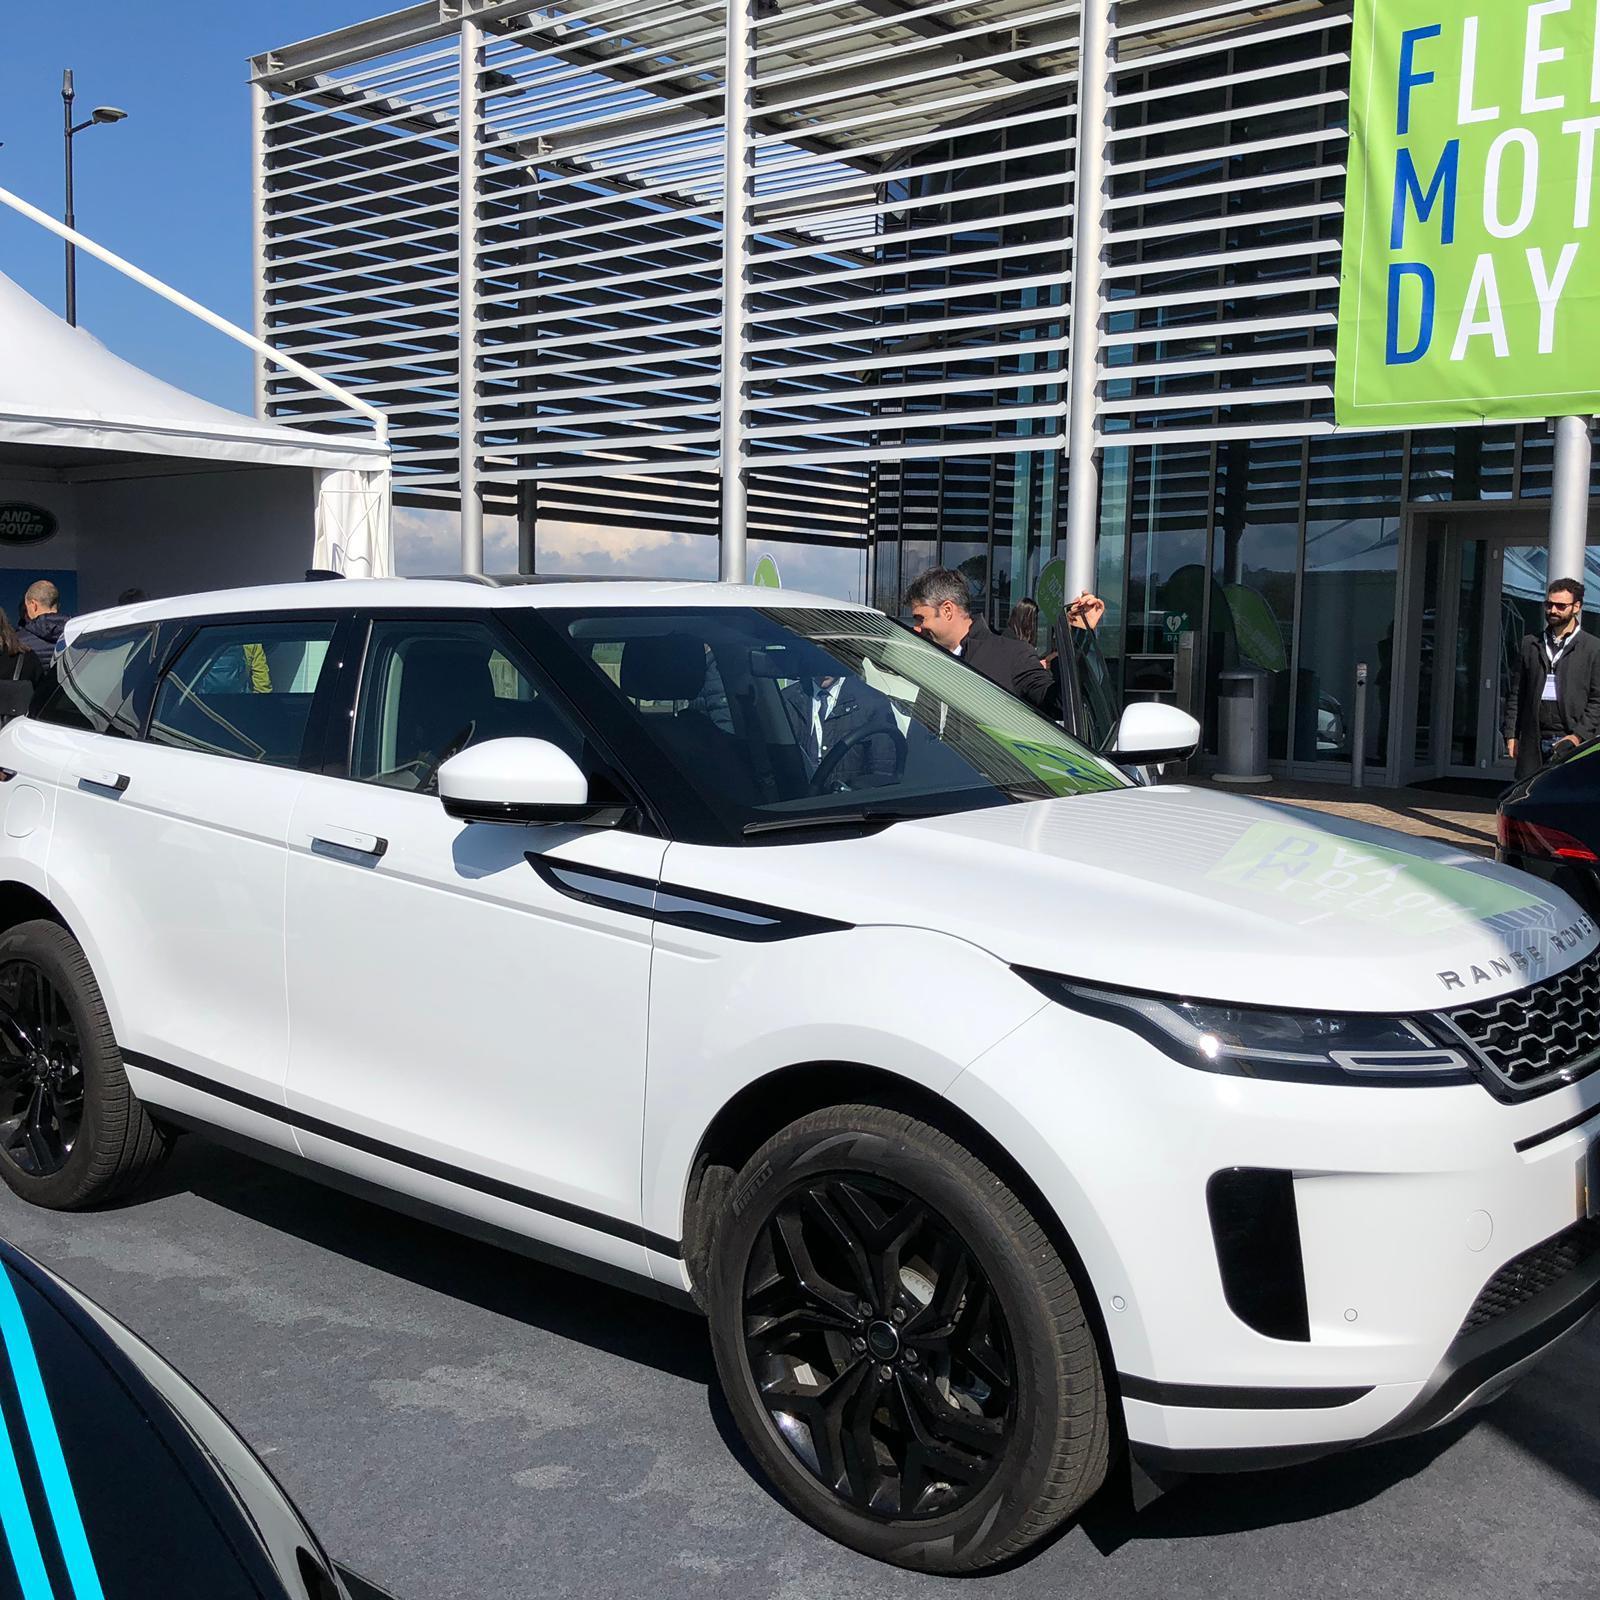 range-rover-evoque-anteprima-fleet-motor-day-2019